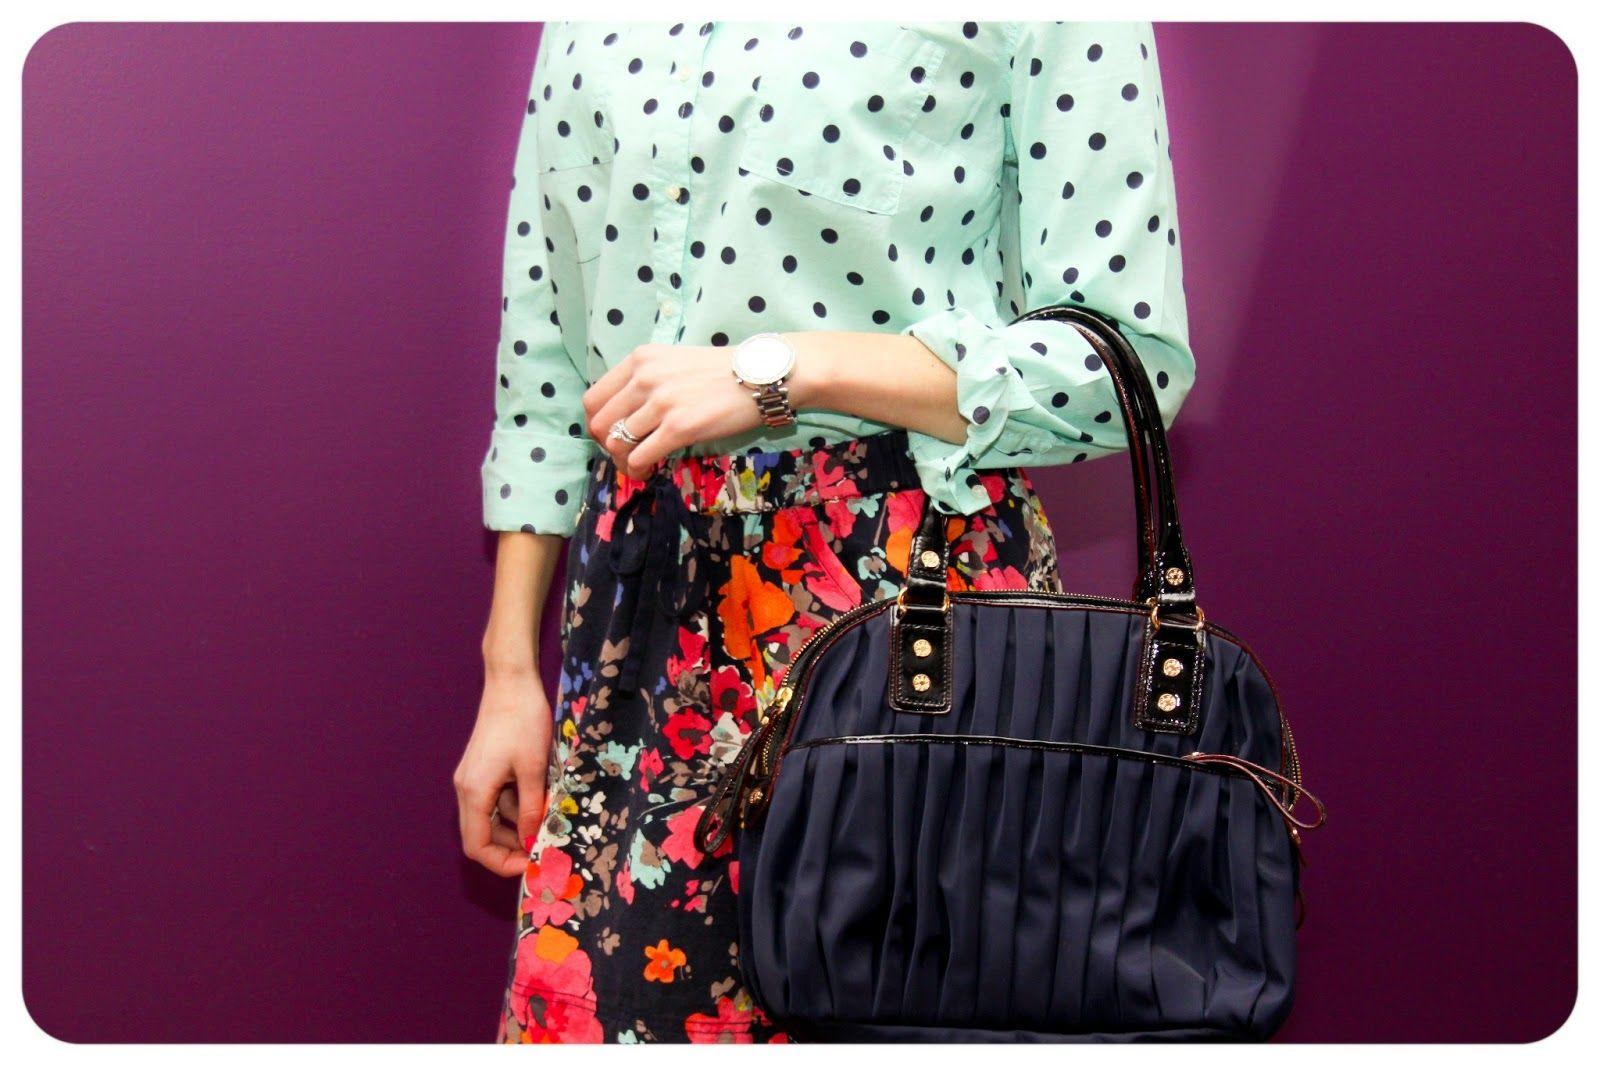 Target Polka dots, Target skirt, MZ Wallace Bea Fashion